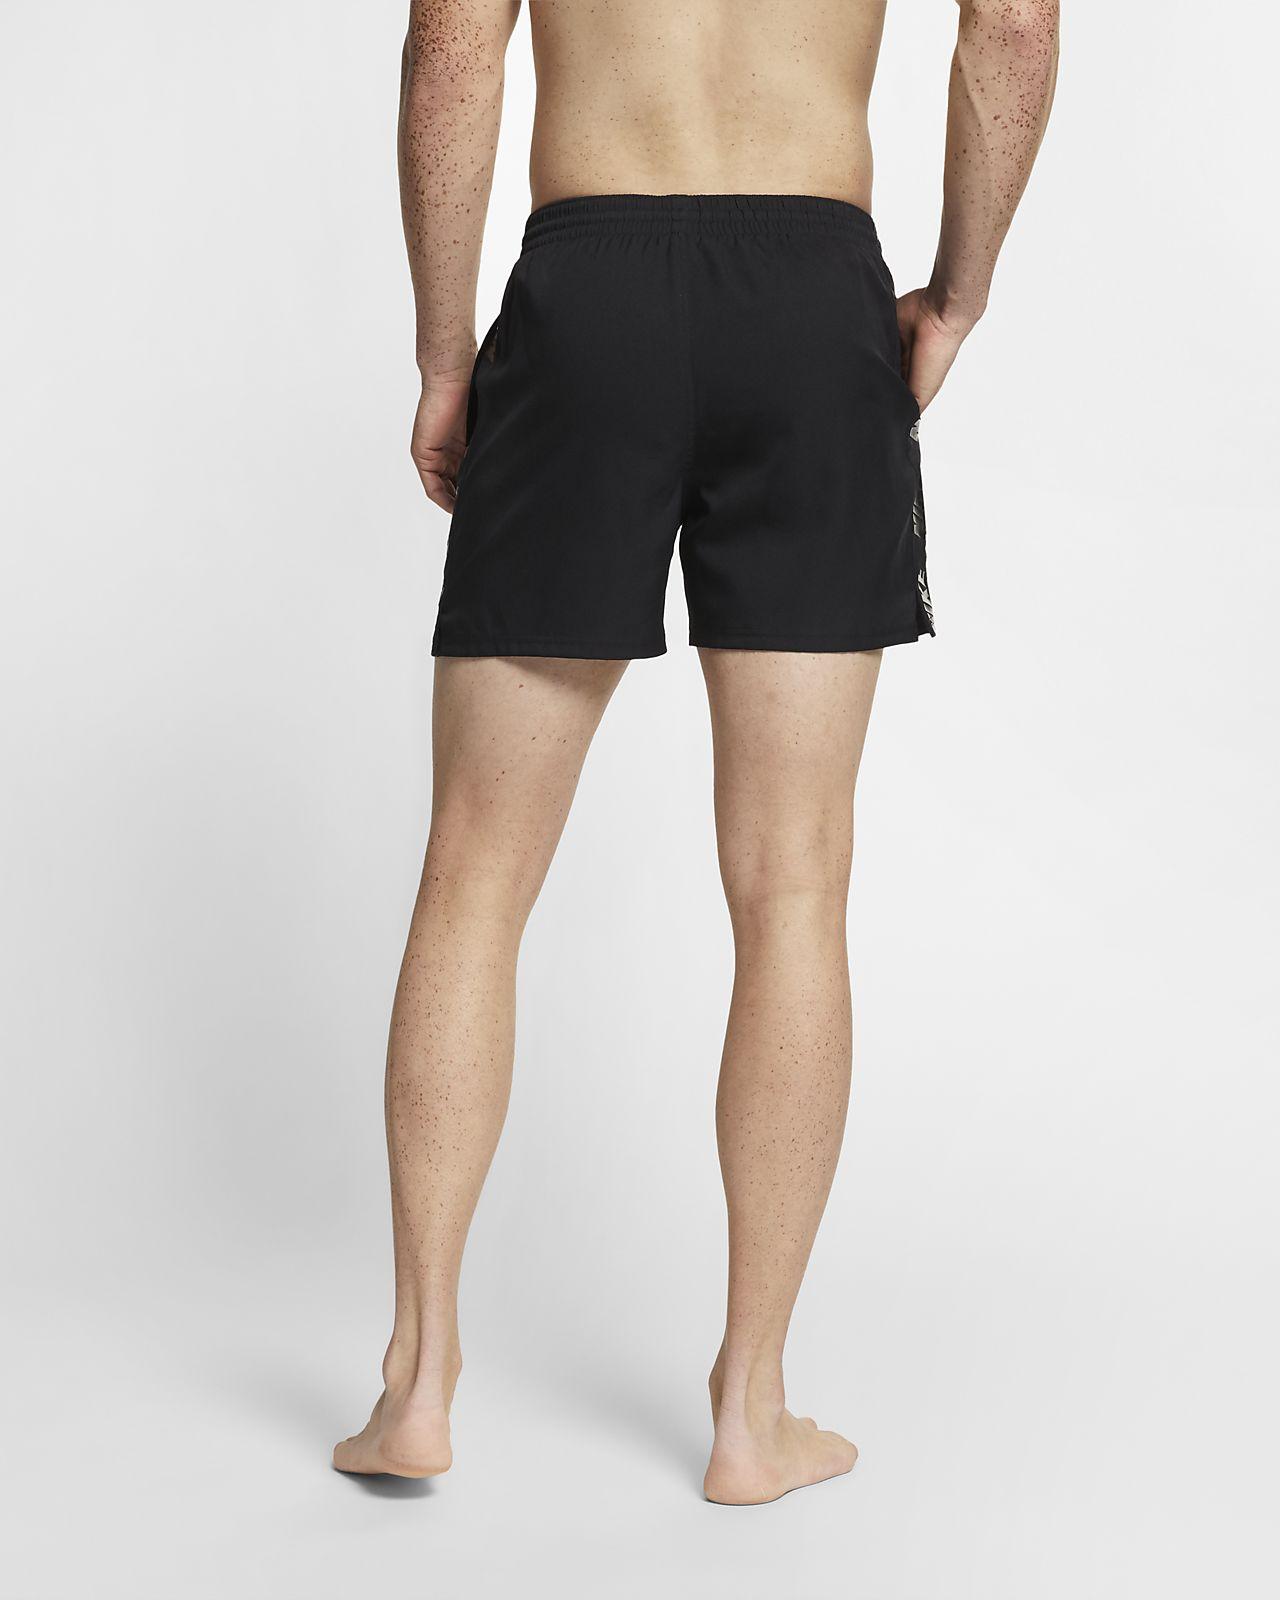 335eef03a5d6 Swimming Trunks Nike Swim Logo Splice Racer Men s 13cm (approx.) Swimming  Trunks